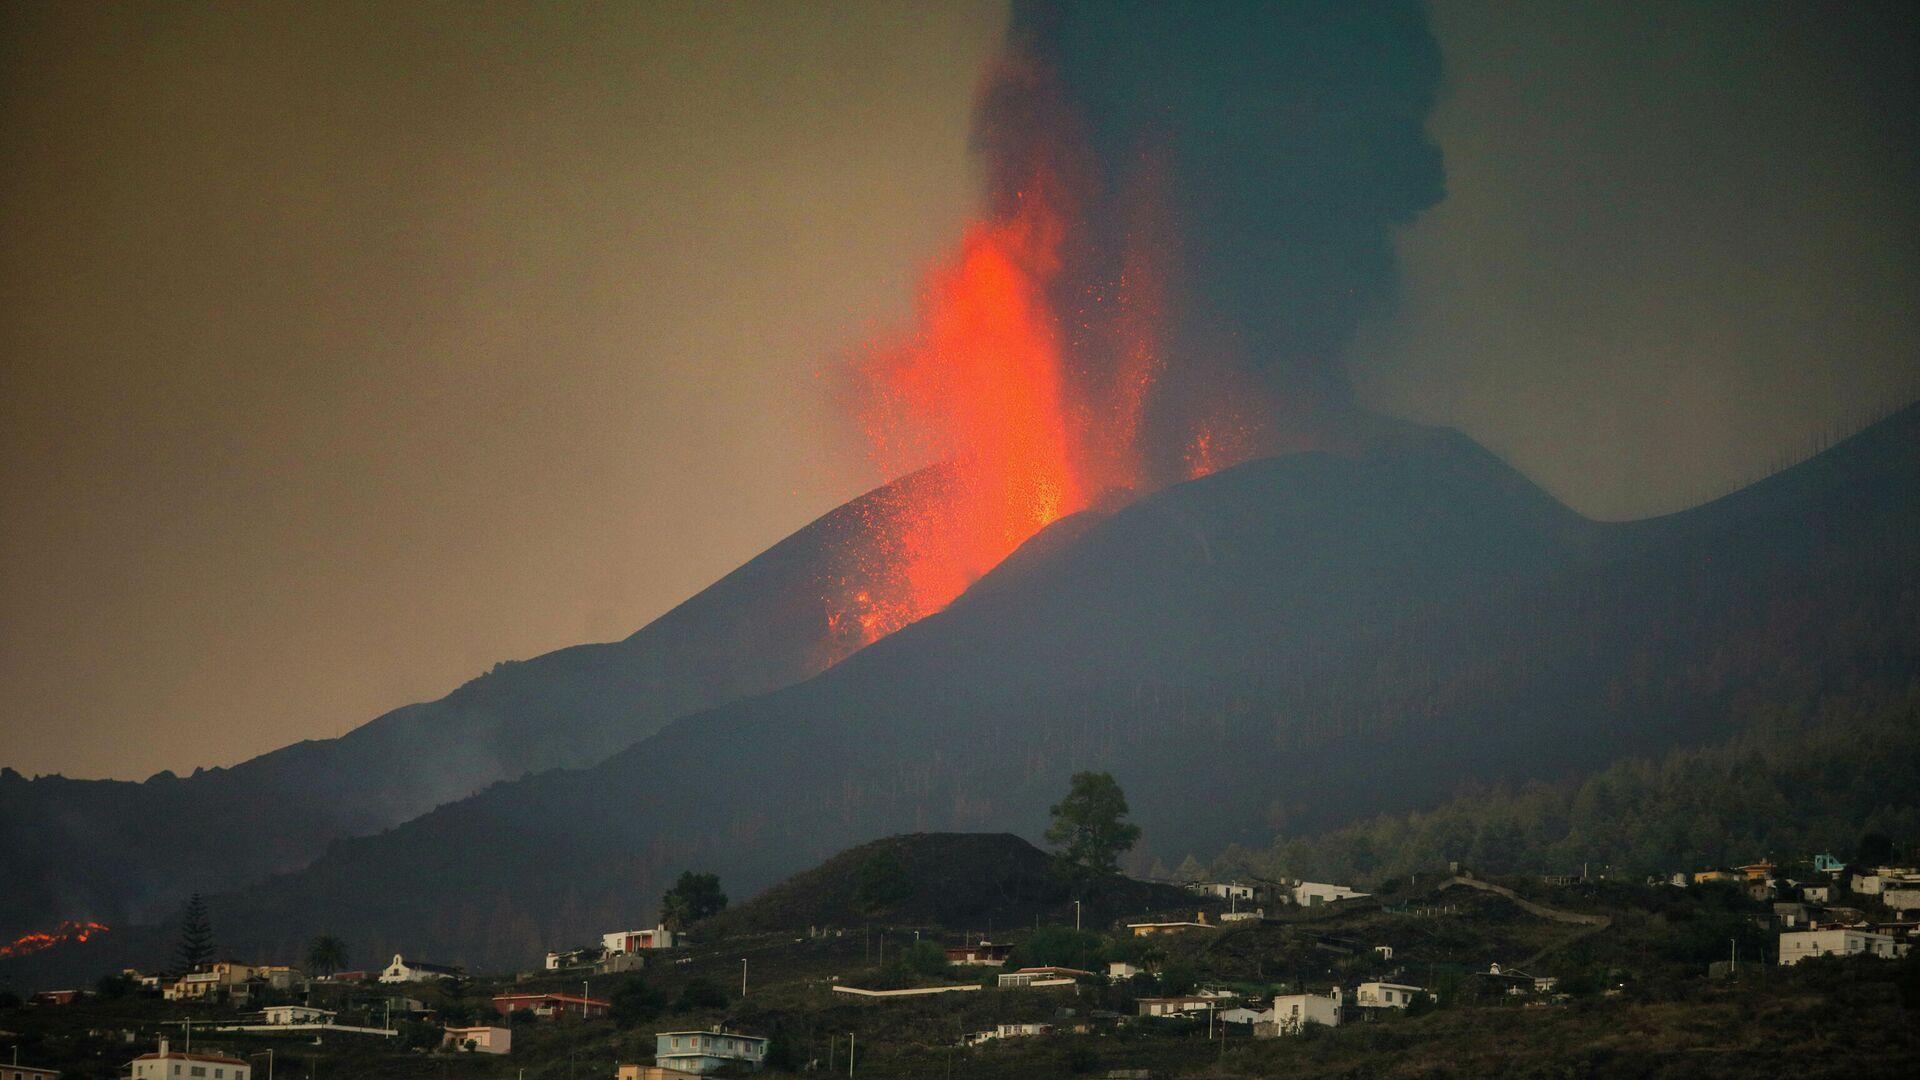 El volcán de La Palma se reactiva - Sputnik Mundo, 1920, 27.09.2021